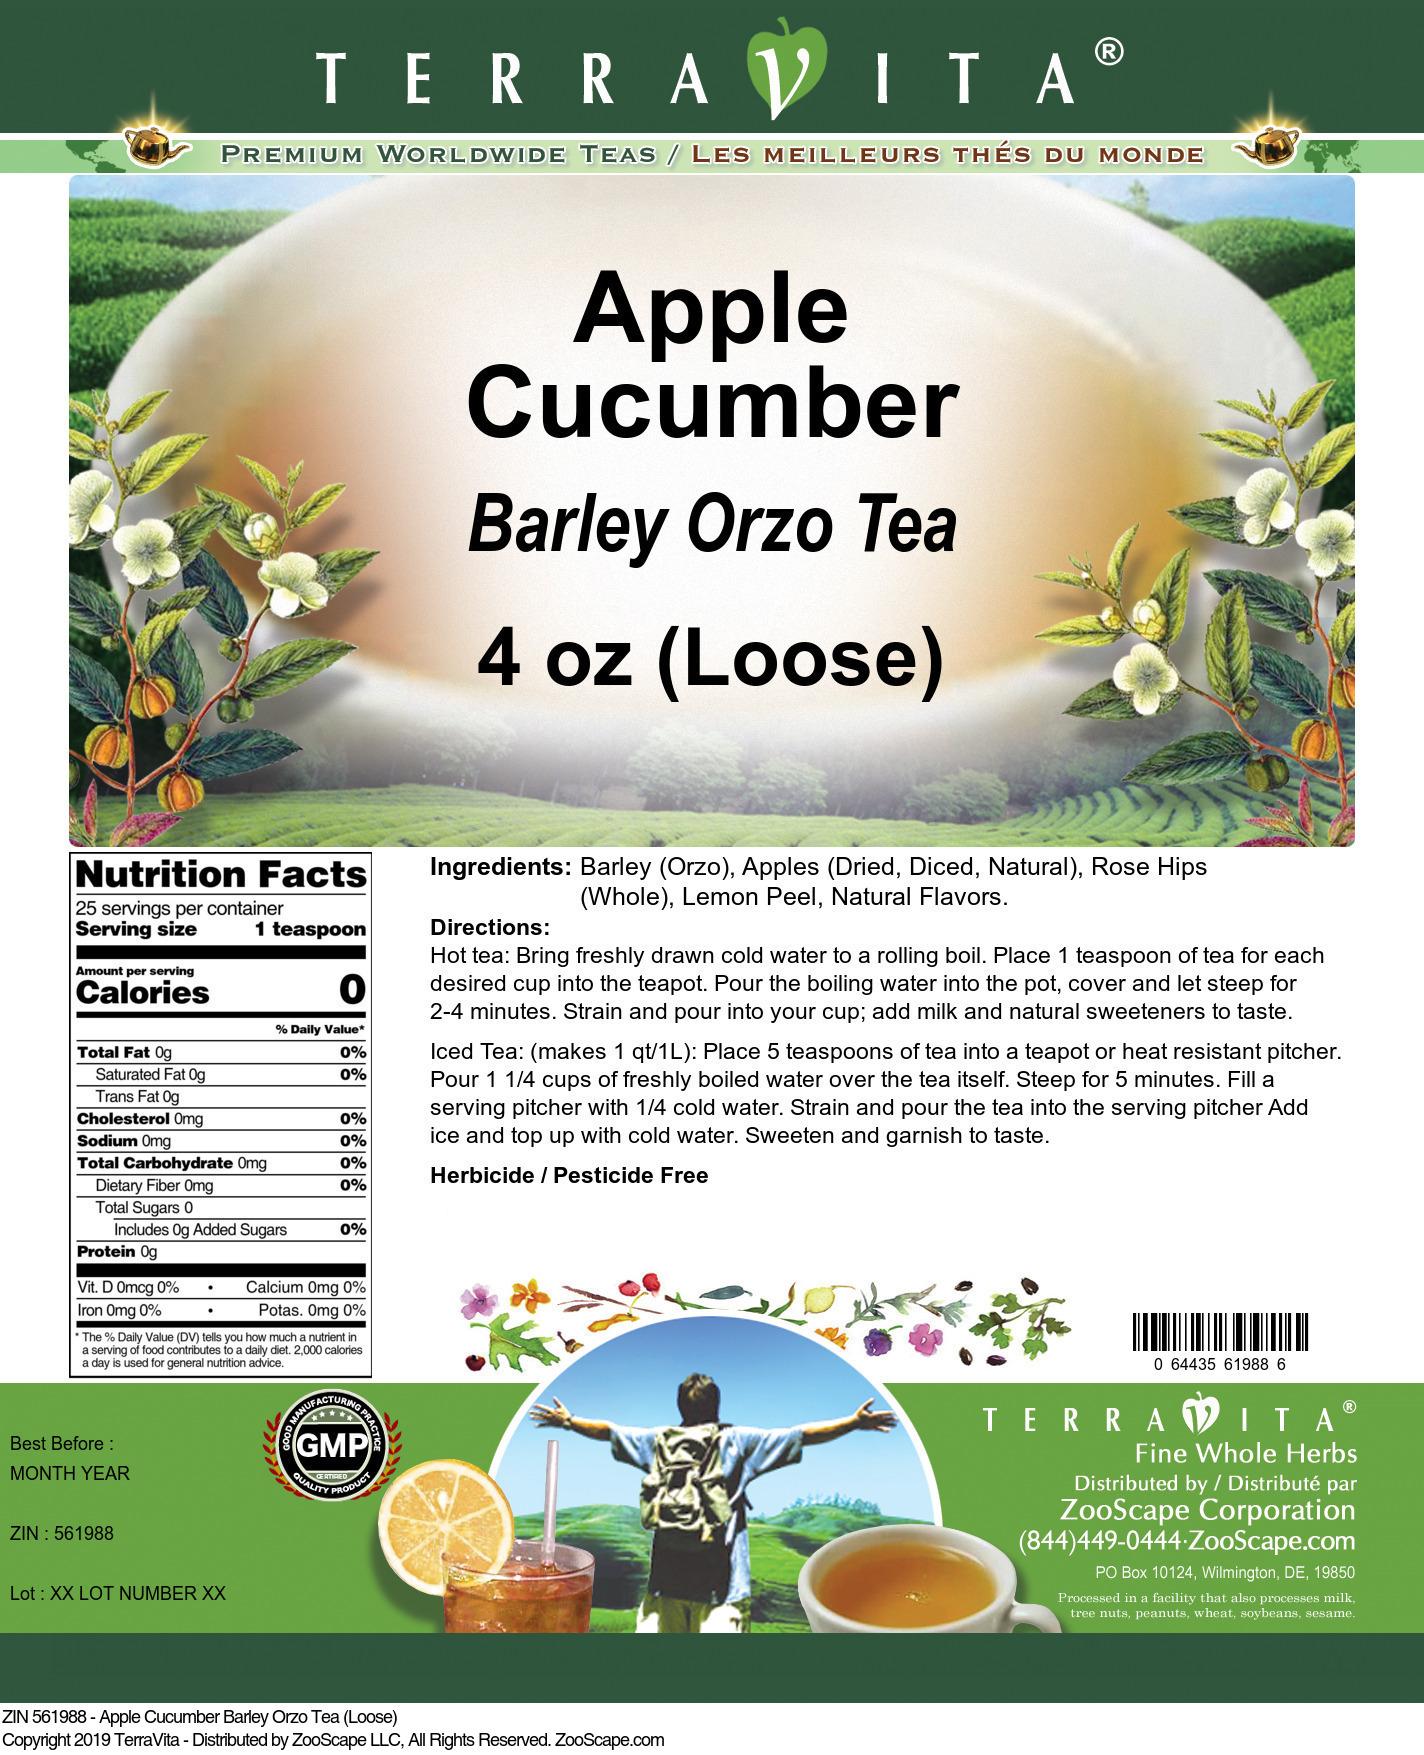 Apple Cucumber Barley Orzo